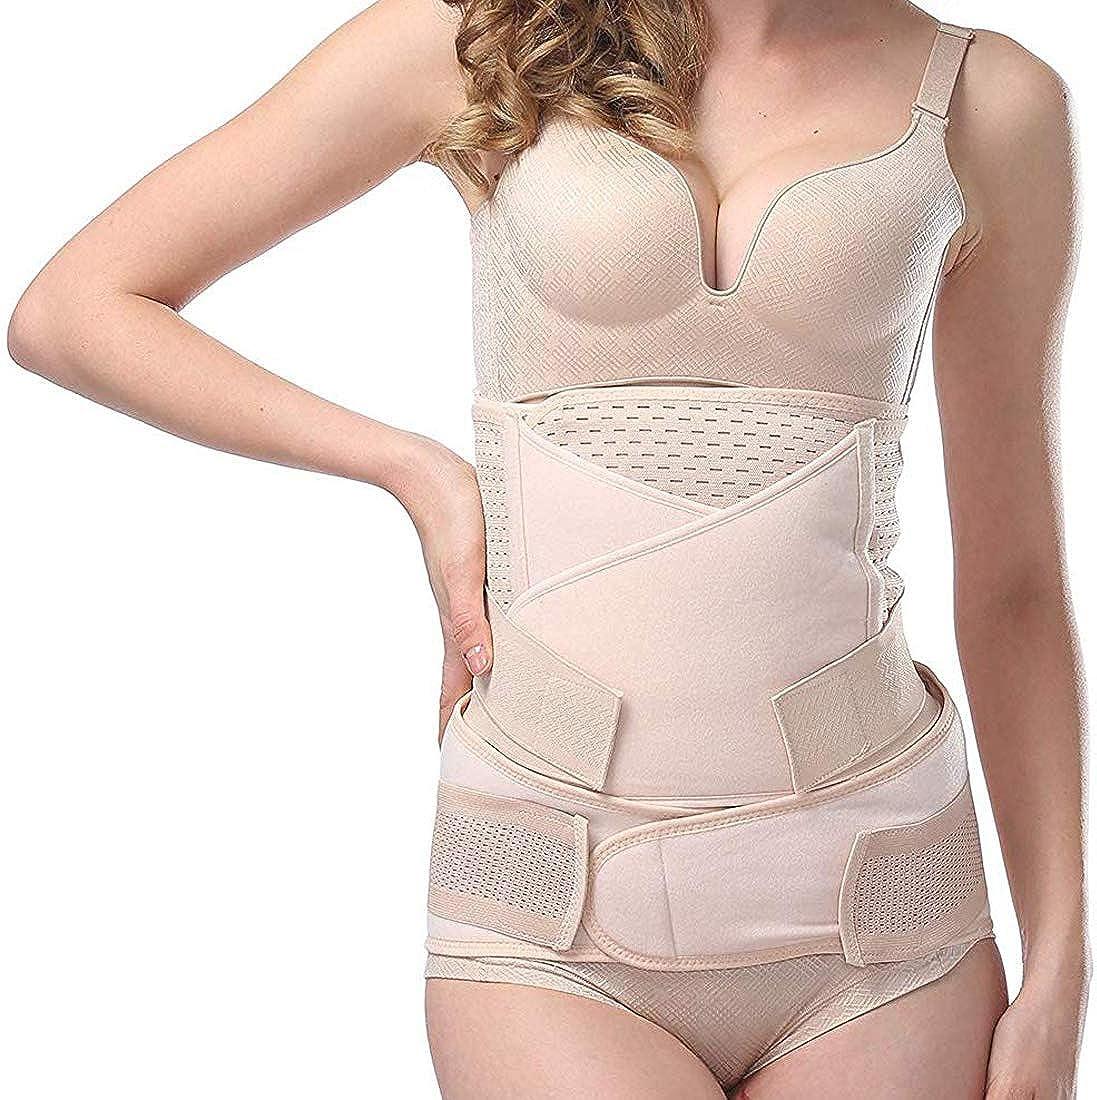 Aigori 3 in 1 Postpartum Belly Wrap C Section Recovery Waist Band Pelvic Belt Body Postpartum Shapewear /…